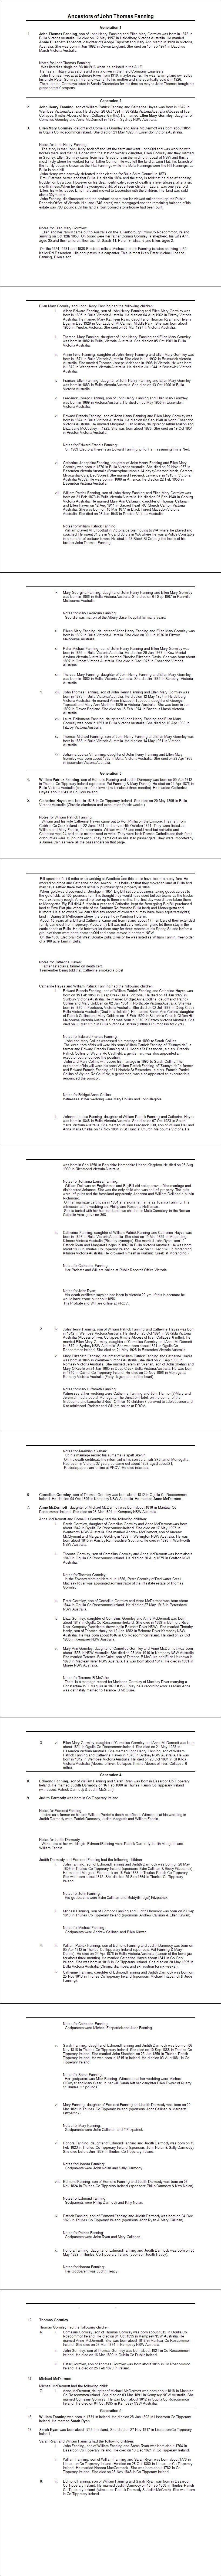 John Thomas Fanning Ancestor Report 2015